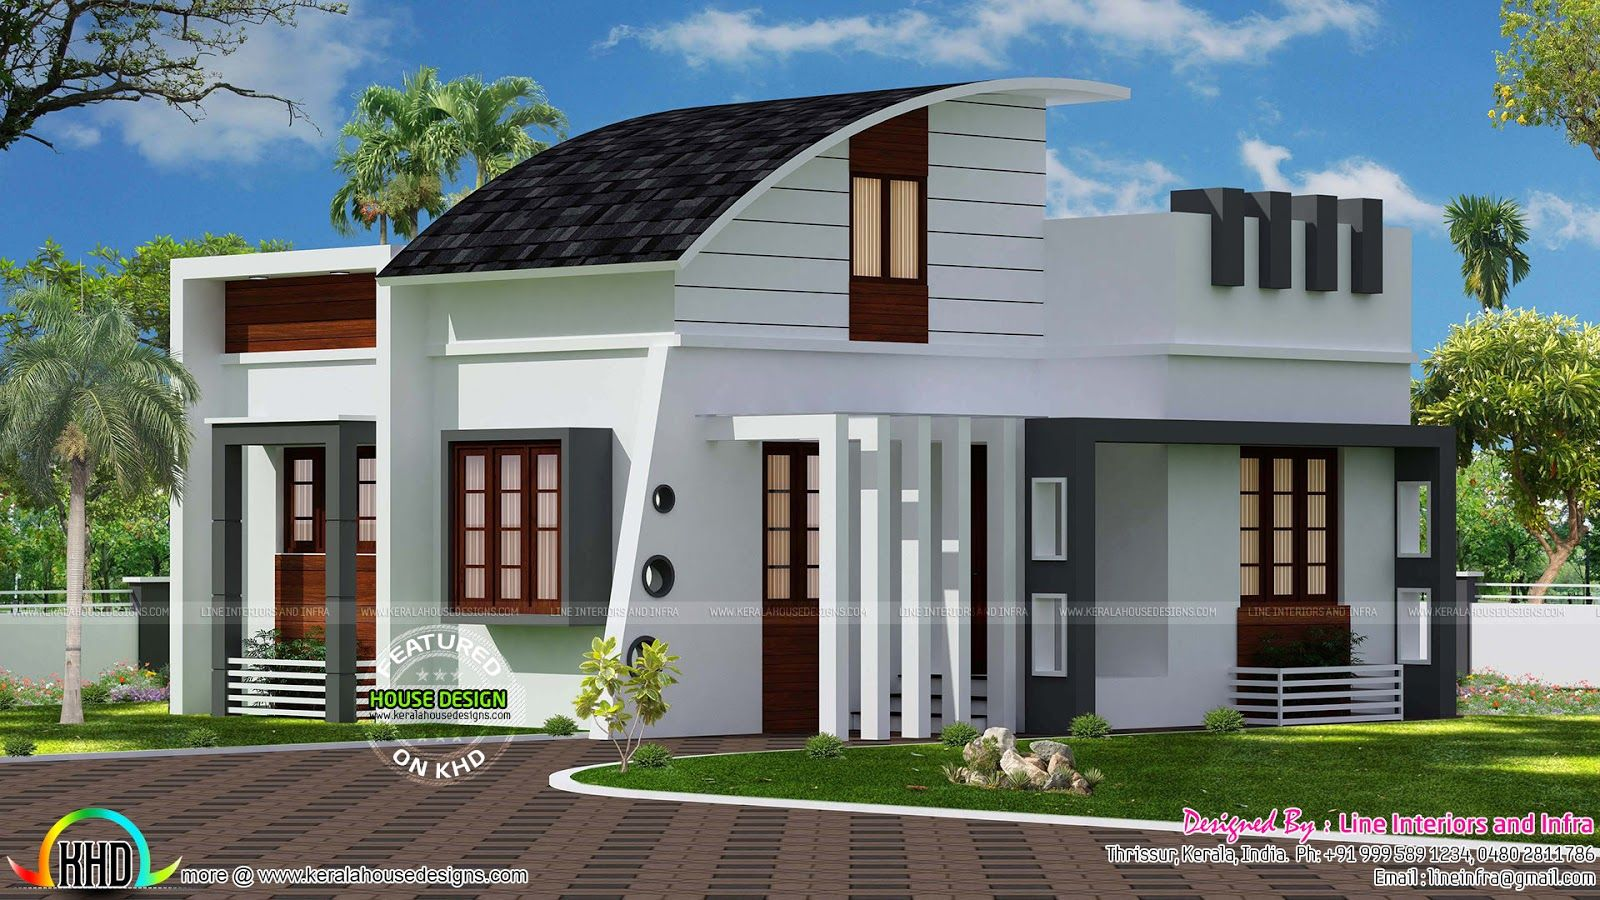 contemporary-single-floor-home.jp (1600×900) | homedesign2 ...